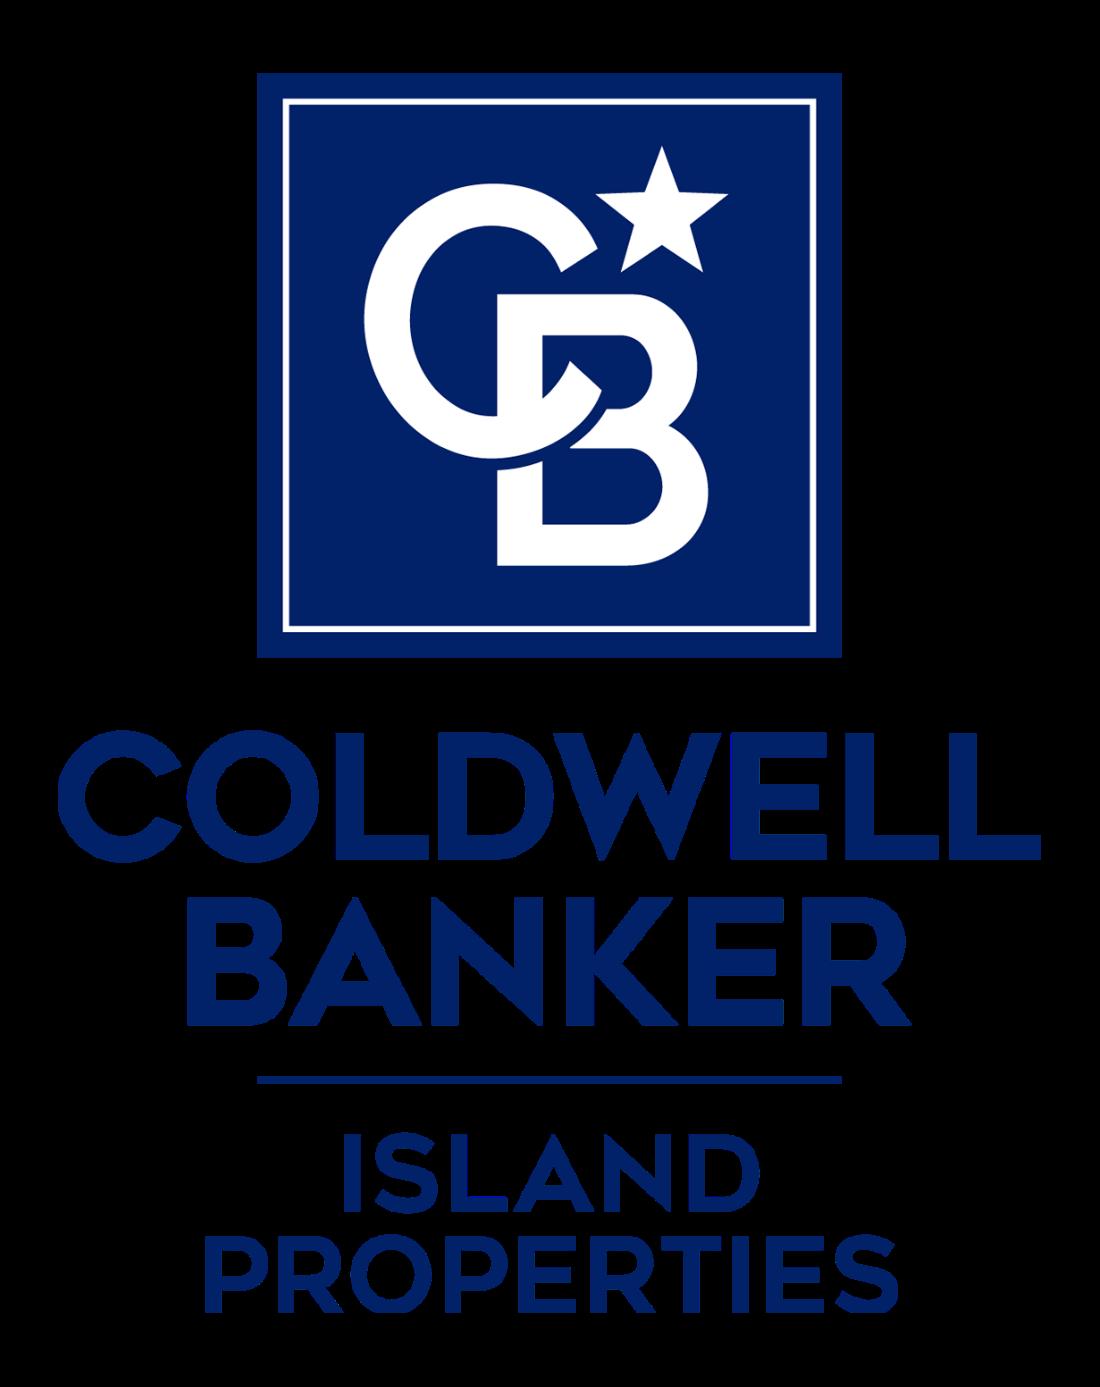 Peter Yaksic - Coldwell Banker Island Properties Logo